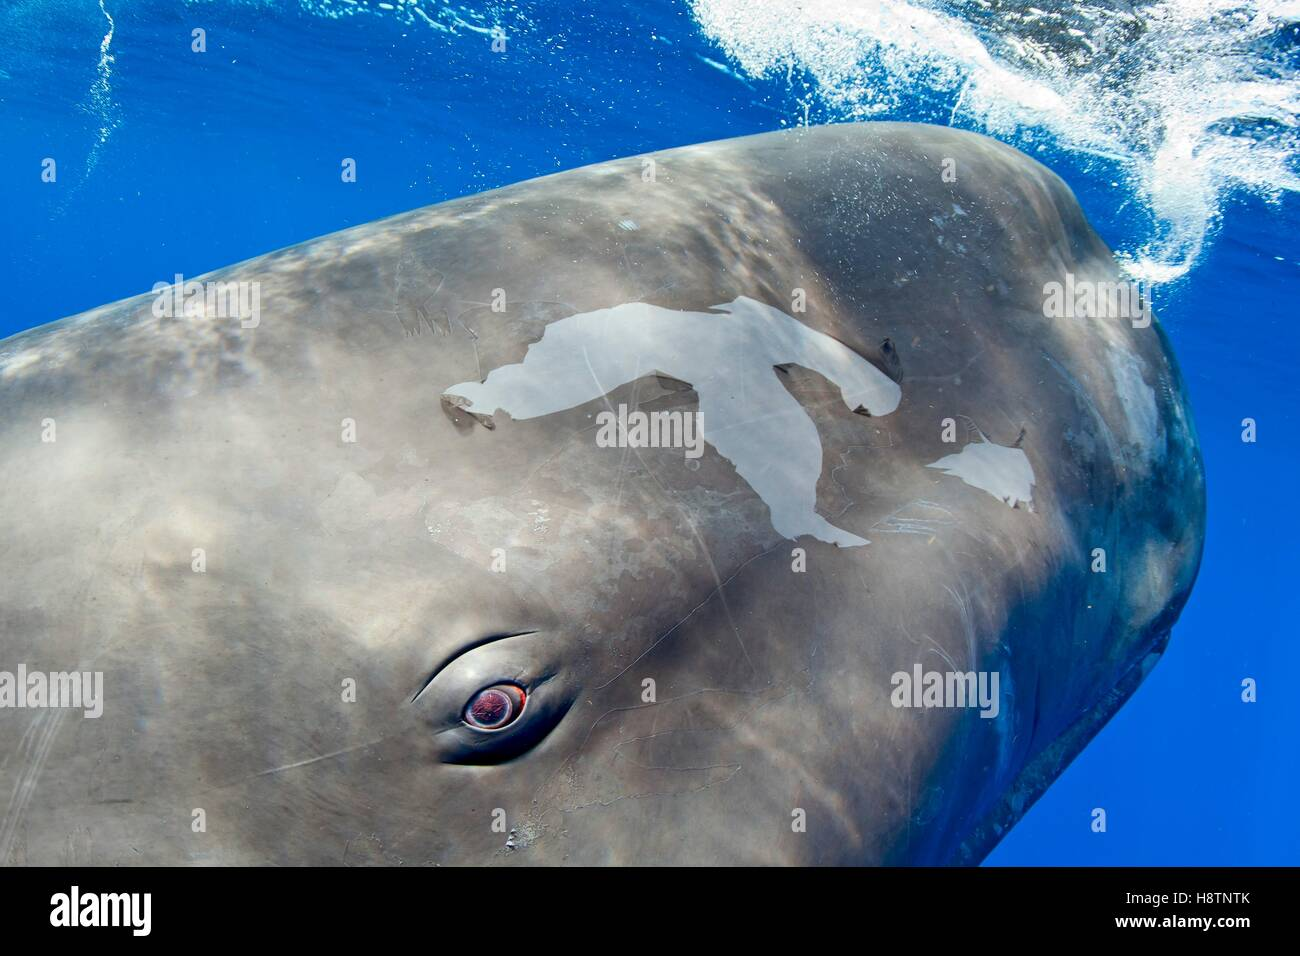 Sperm Whale Anatomy Stock Photos & Sperm Whale Anatomy Stock Images ...